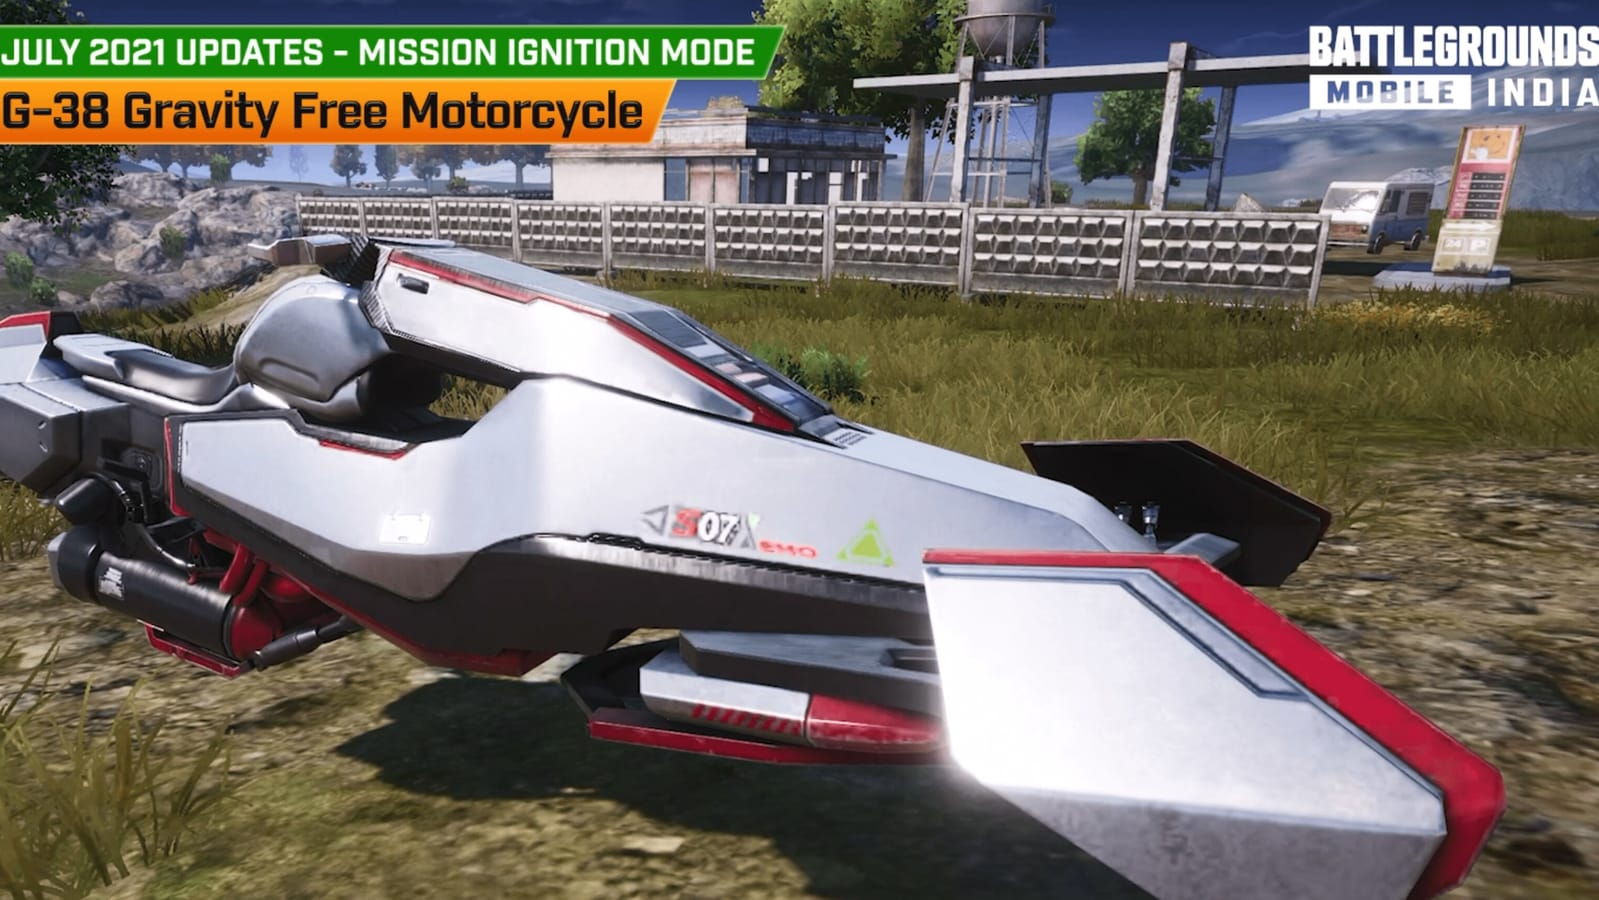 Battlegrounds Mobile India adds Ignition Mode, Tesla Gigafactory, a huge armament;  New BGMI update, 1.5.0